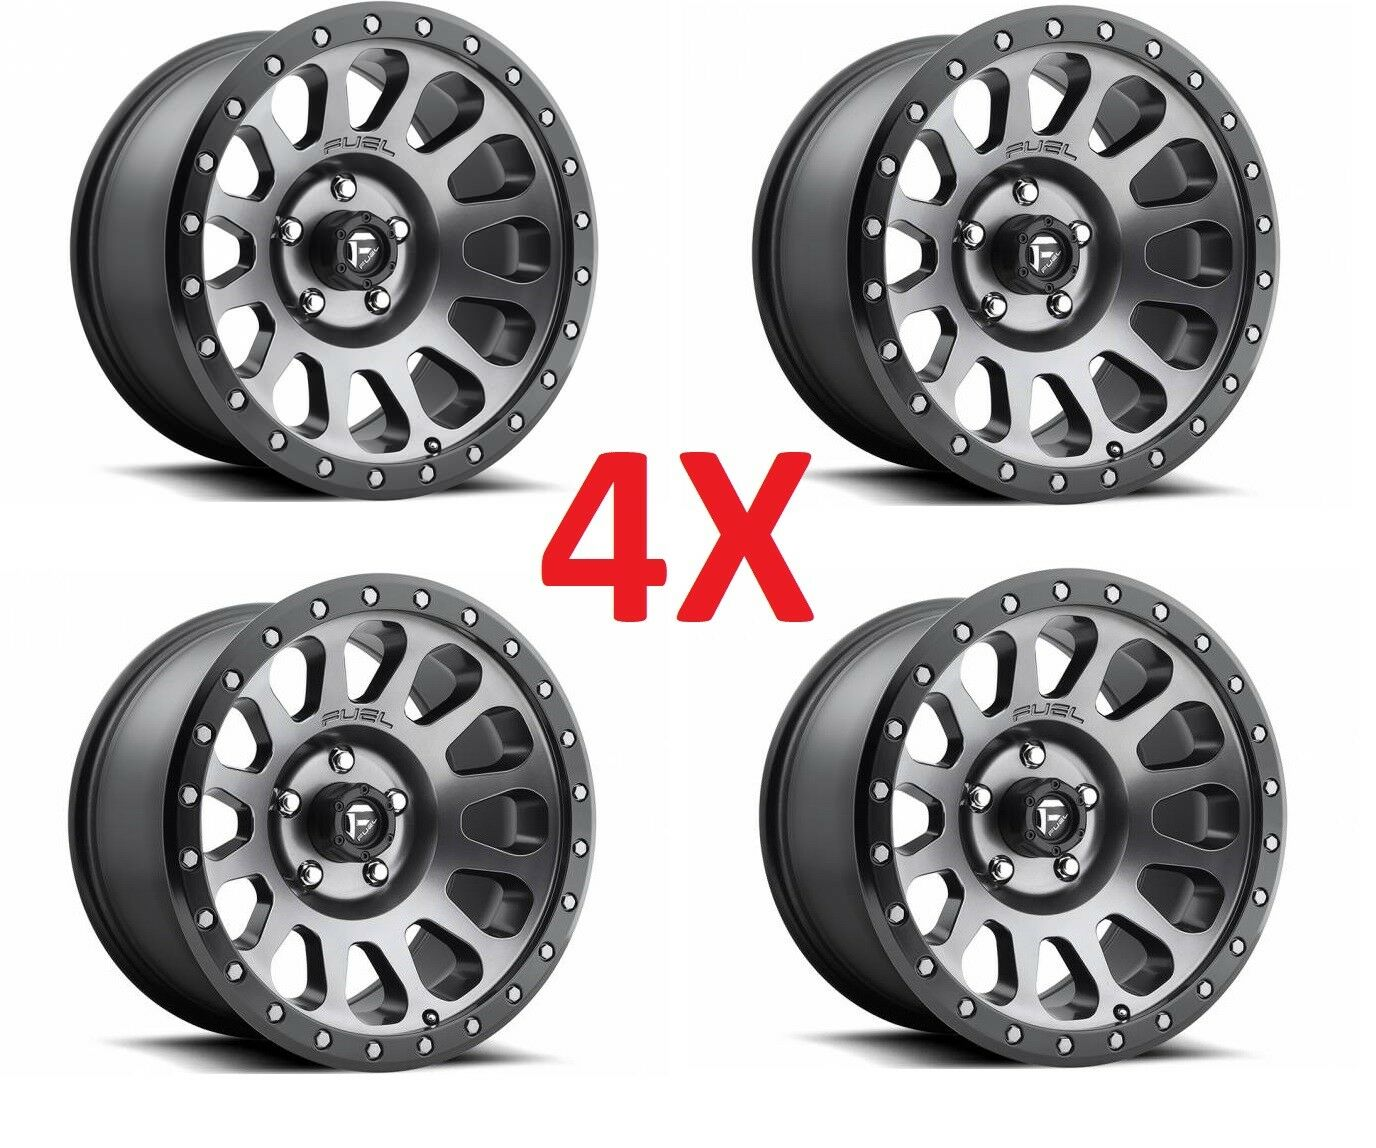 Fuel Wheels 20x9 >> 20x9 Fuel Wheels Rims D601 Matte Gray Grey Black Ring Method Grid Chevrolet Gmc